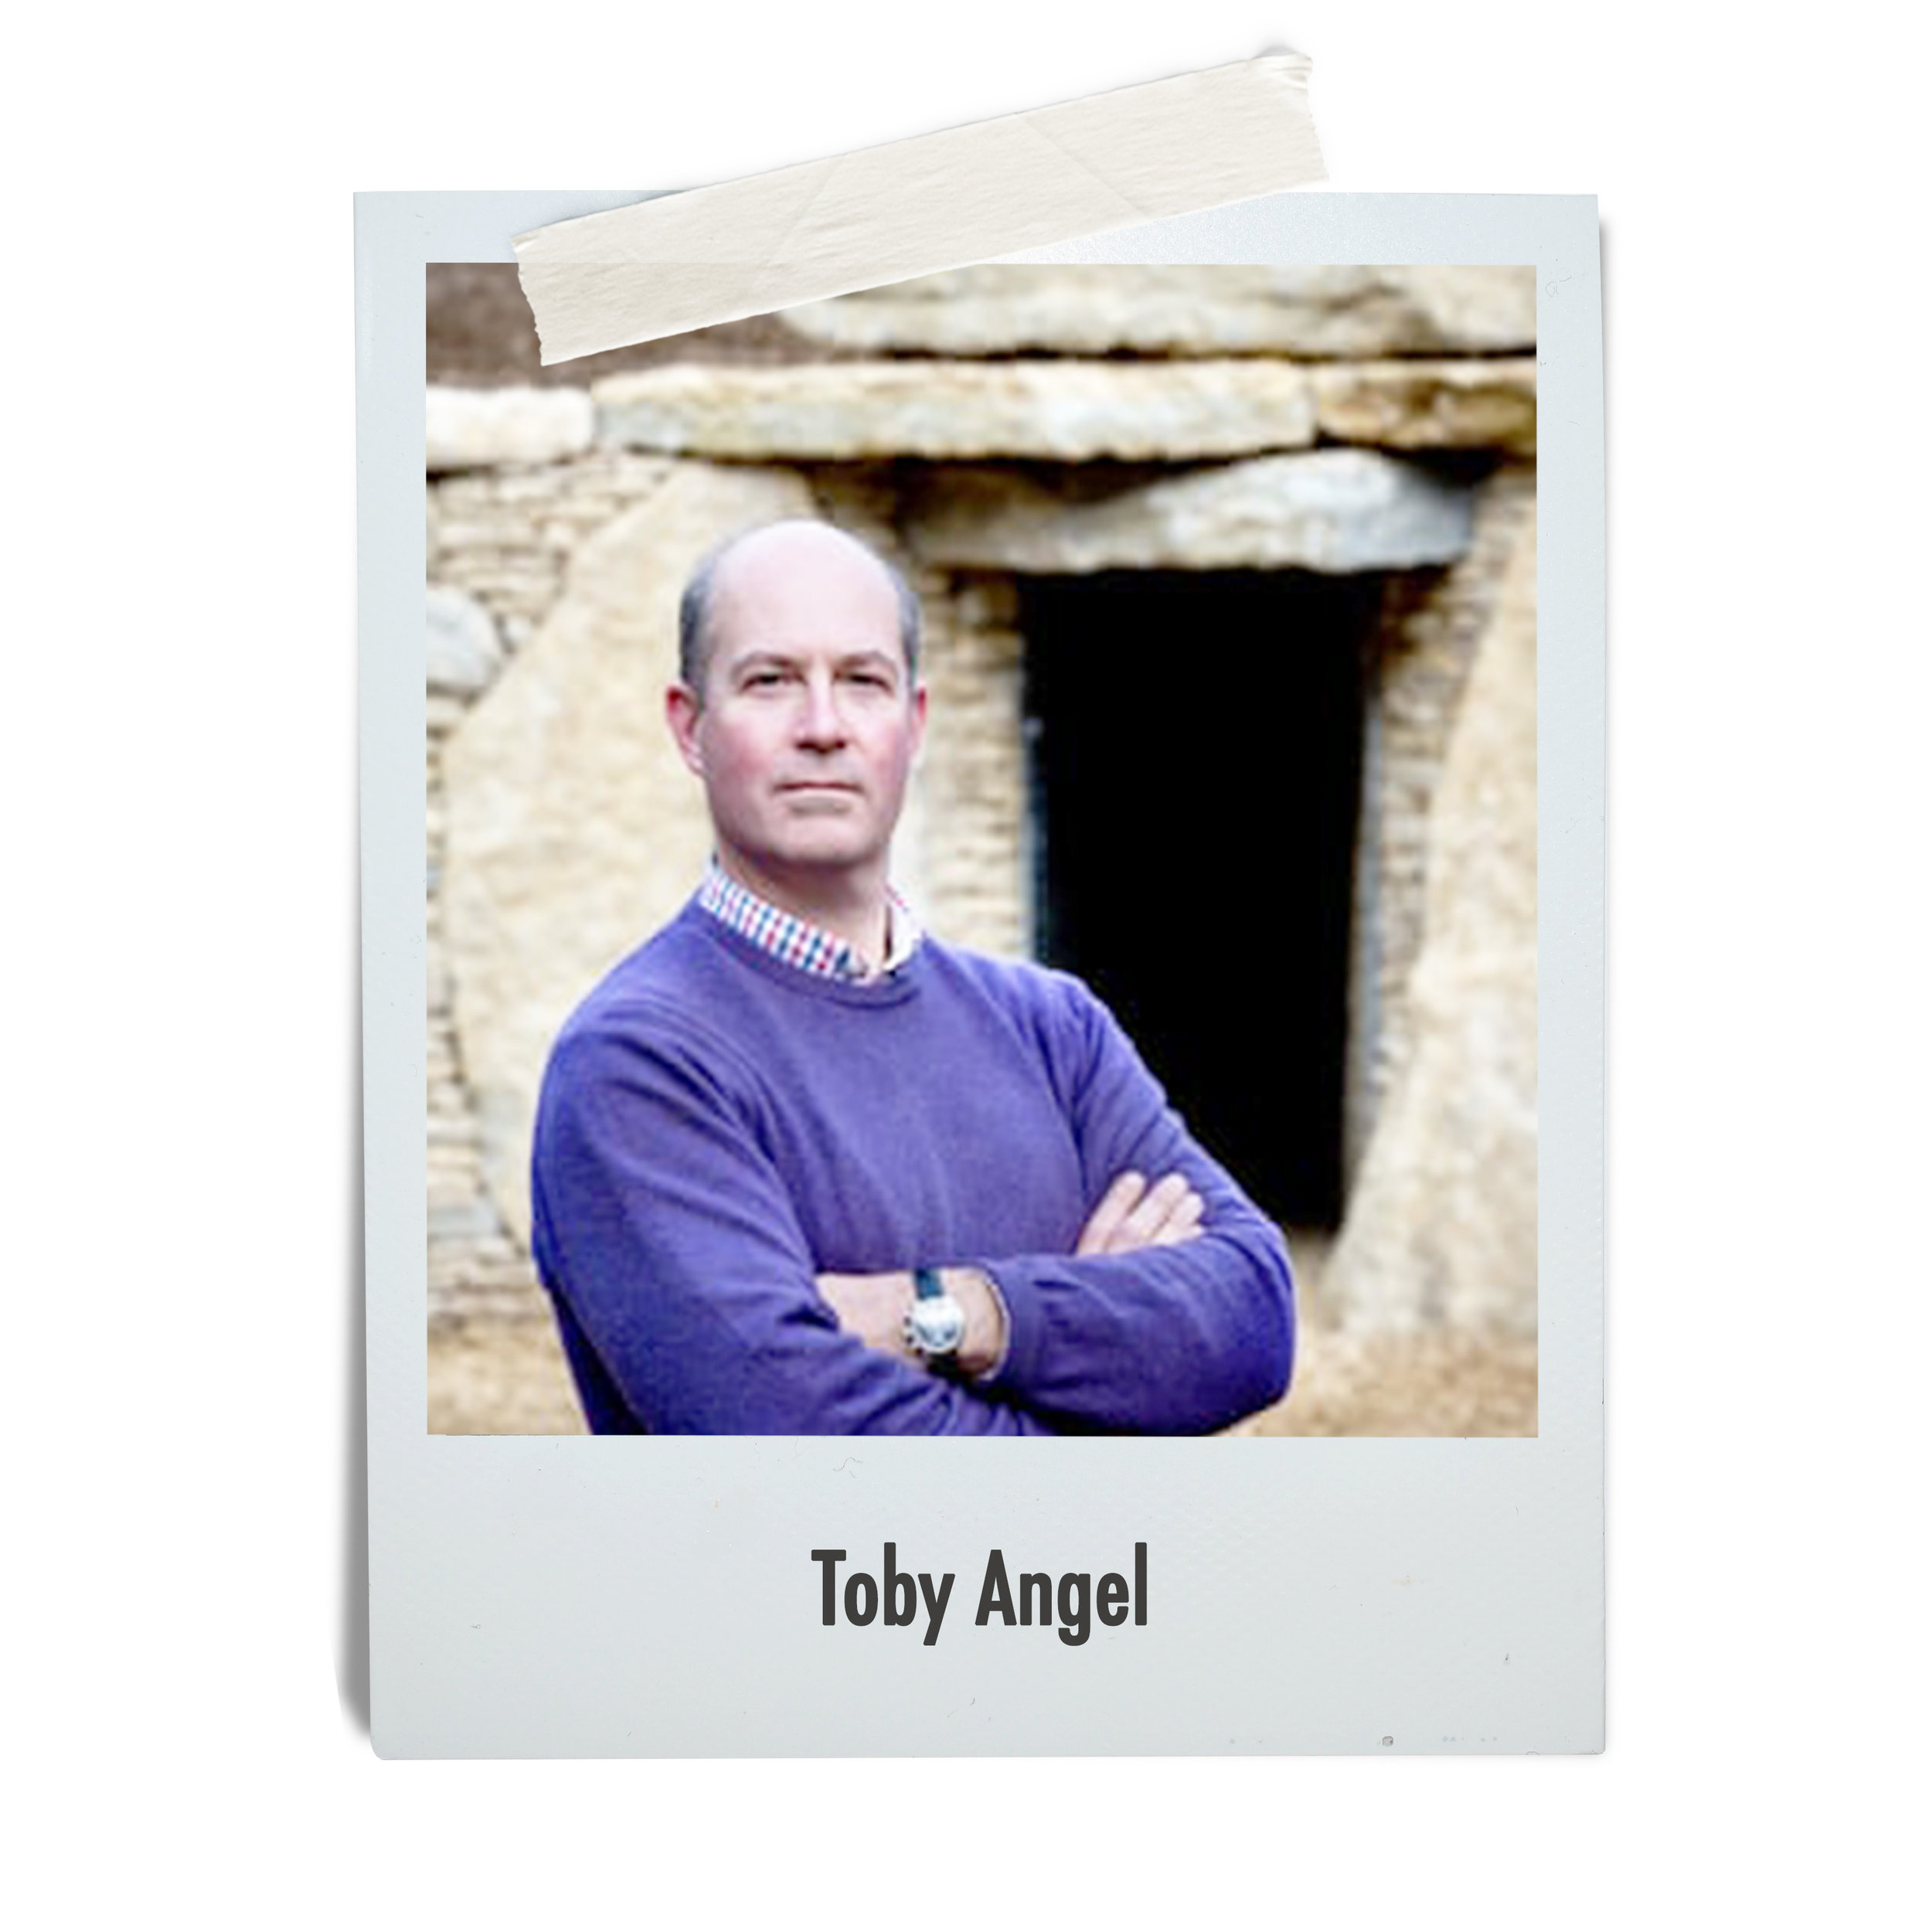 Toby Angel